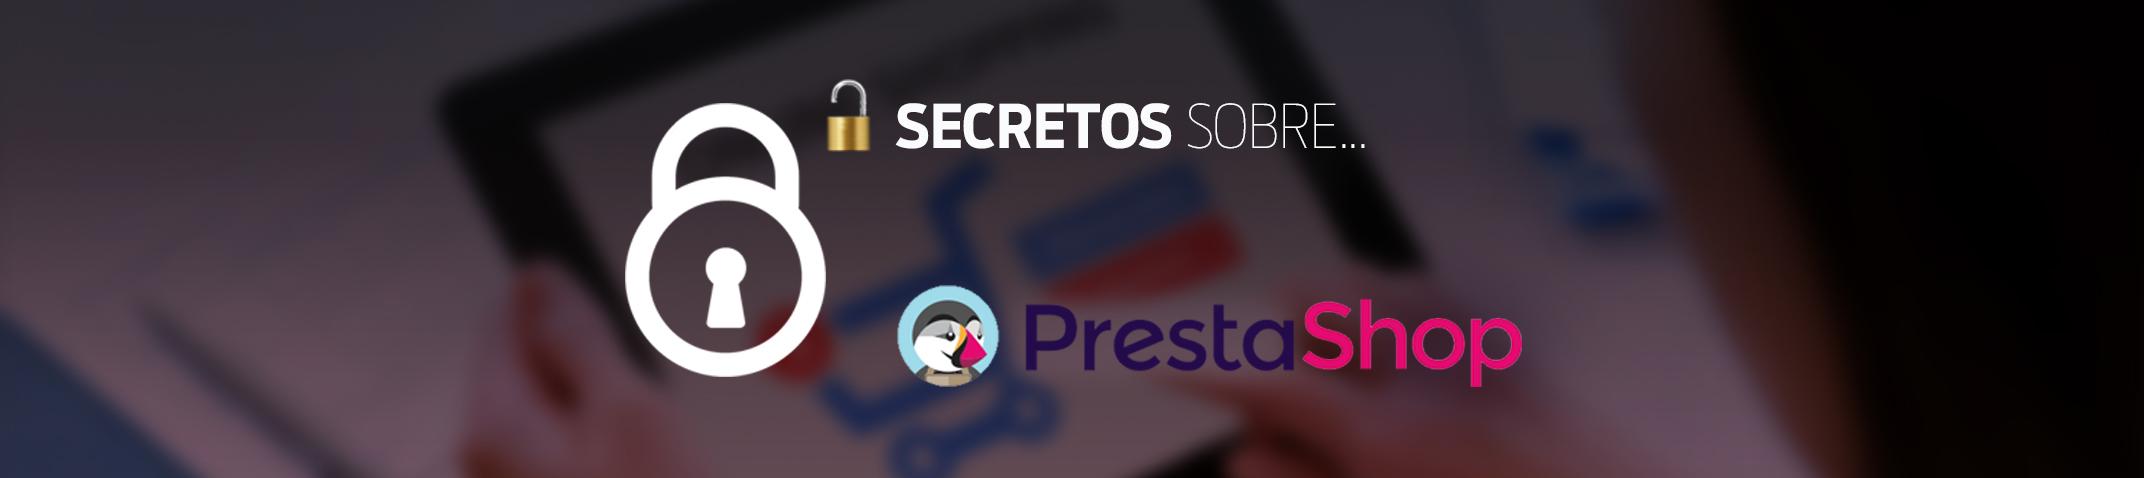 Secretos sobre PrestaShop